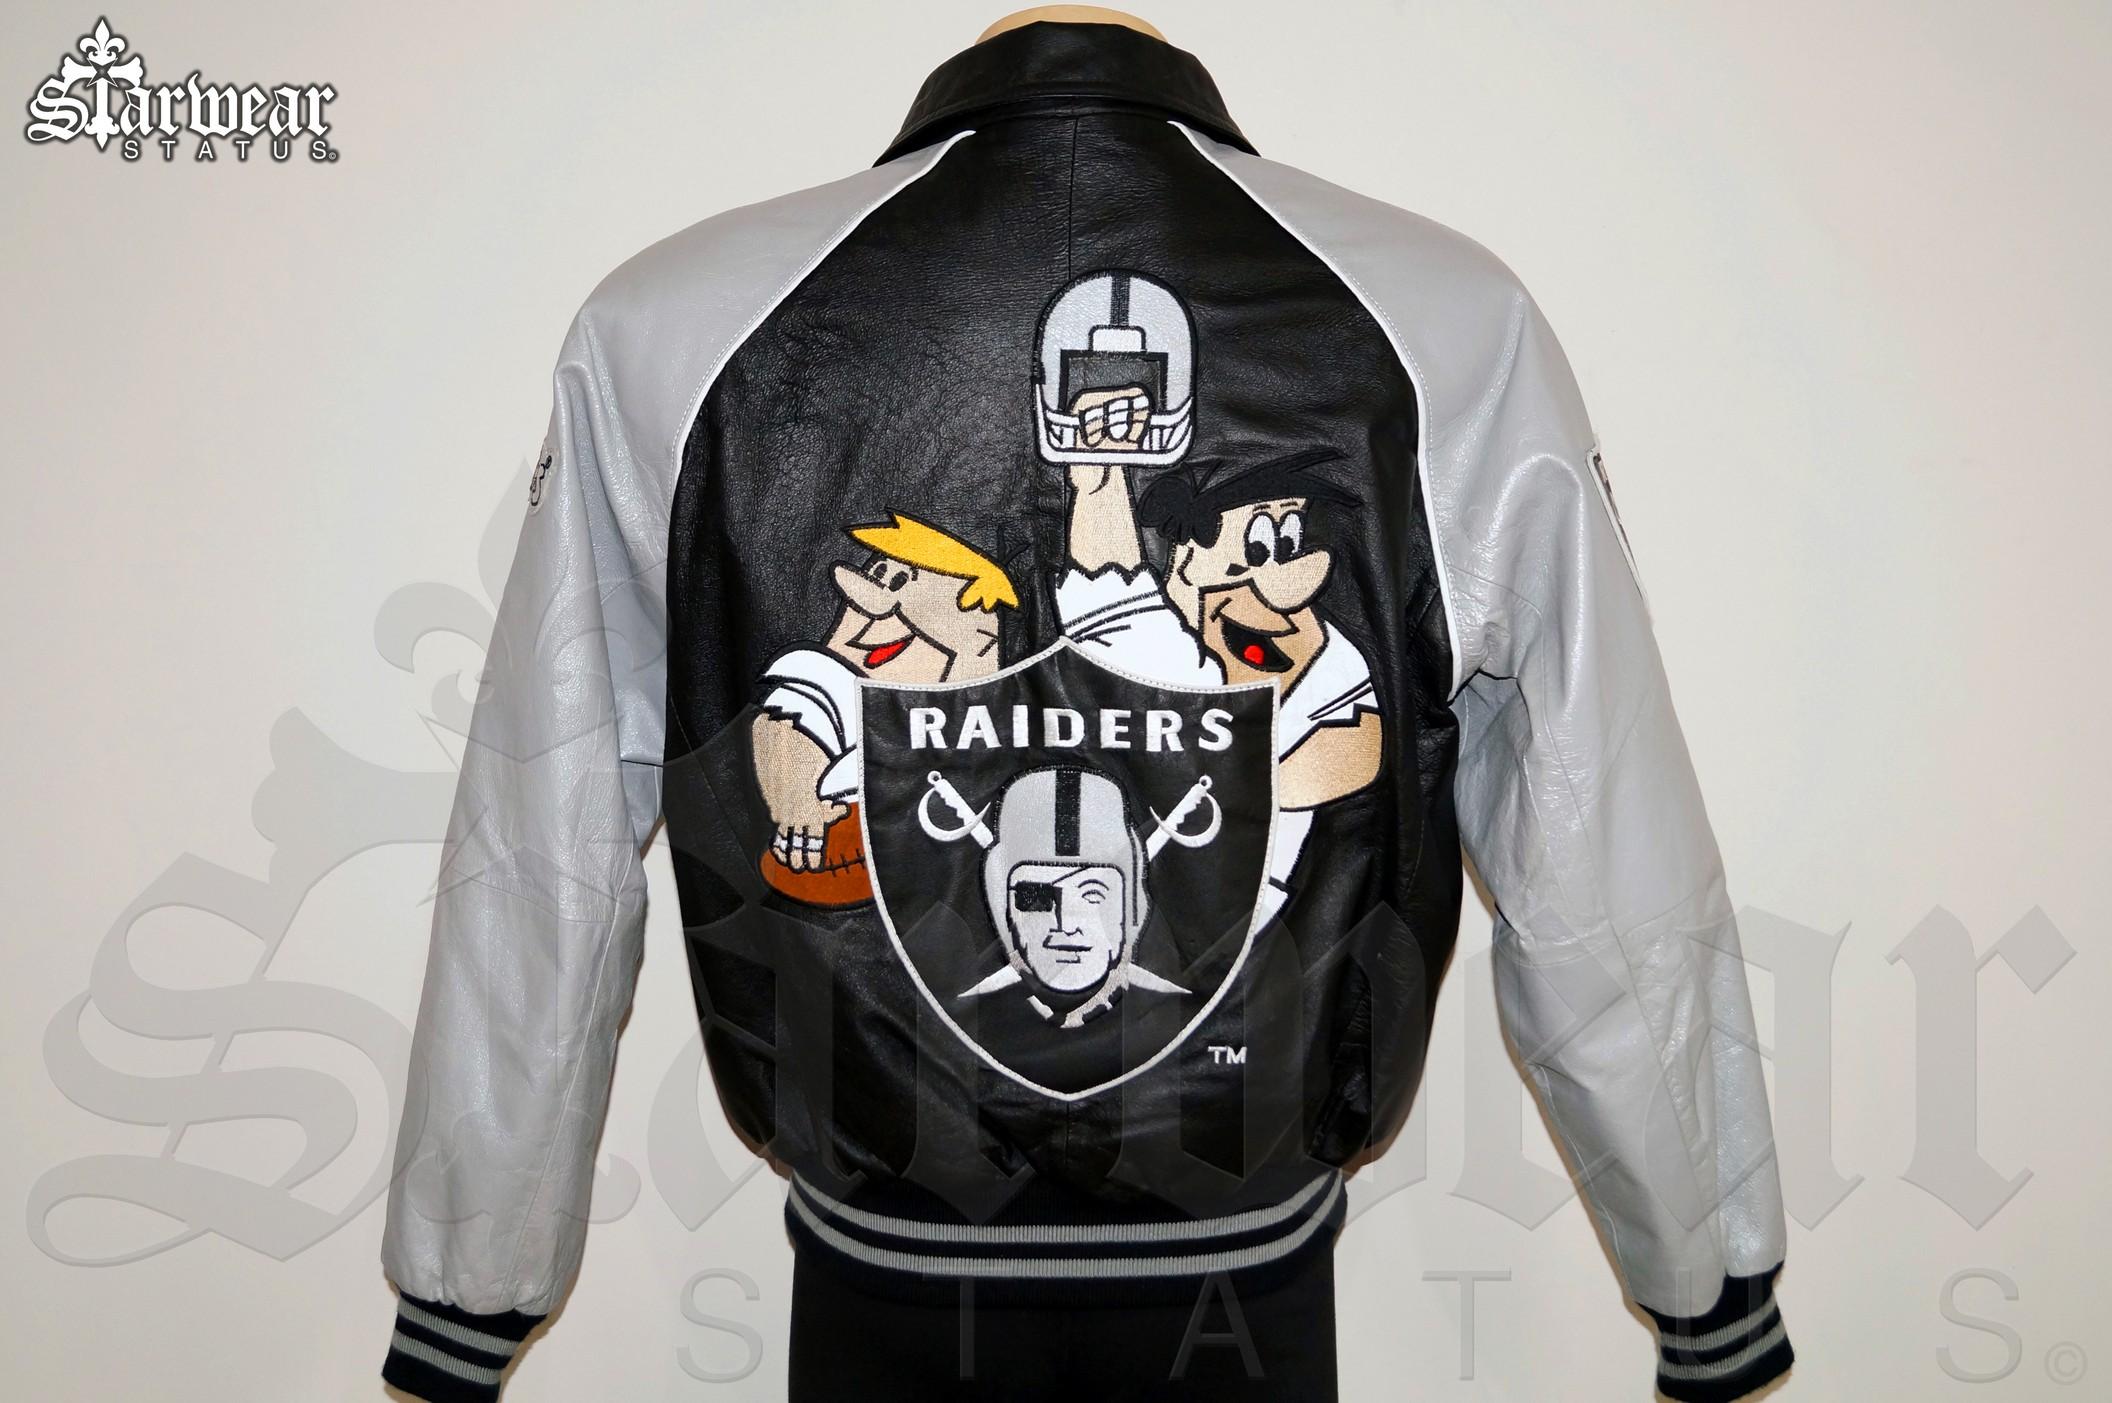 Oakland Raiders Womens Jacket | Raiders Varsity Jacket | Oakland Raiders Coats